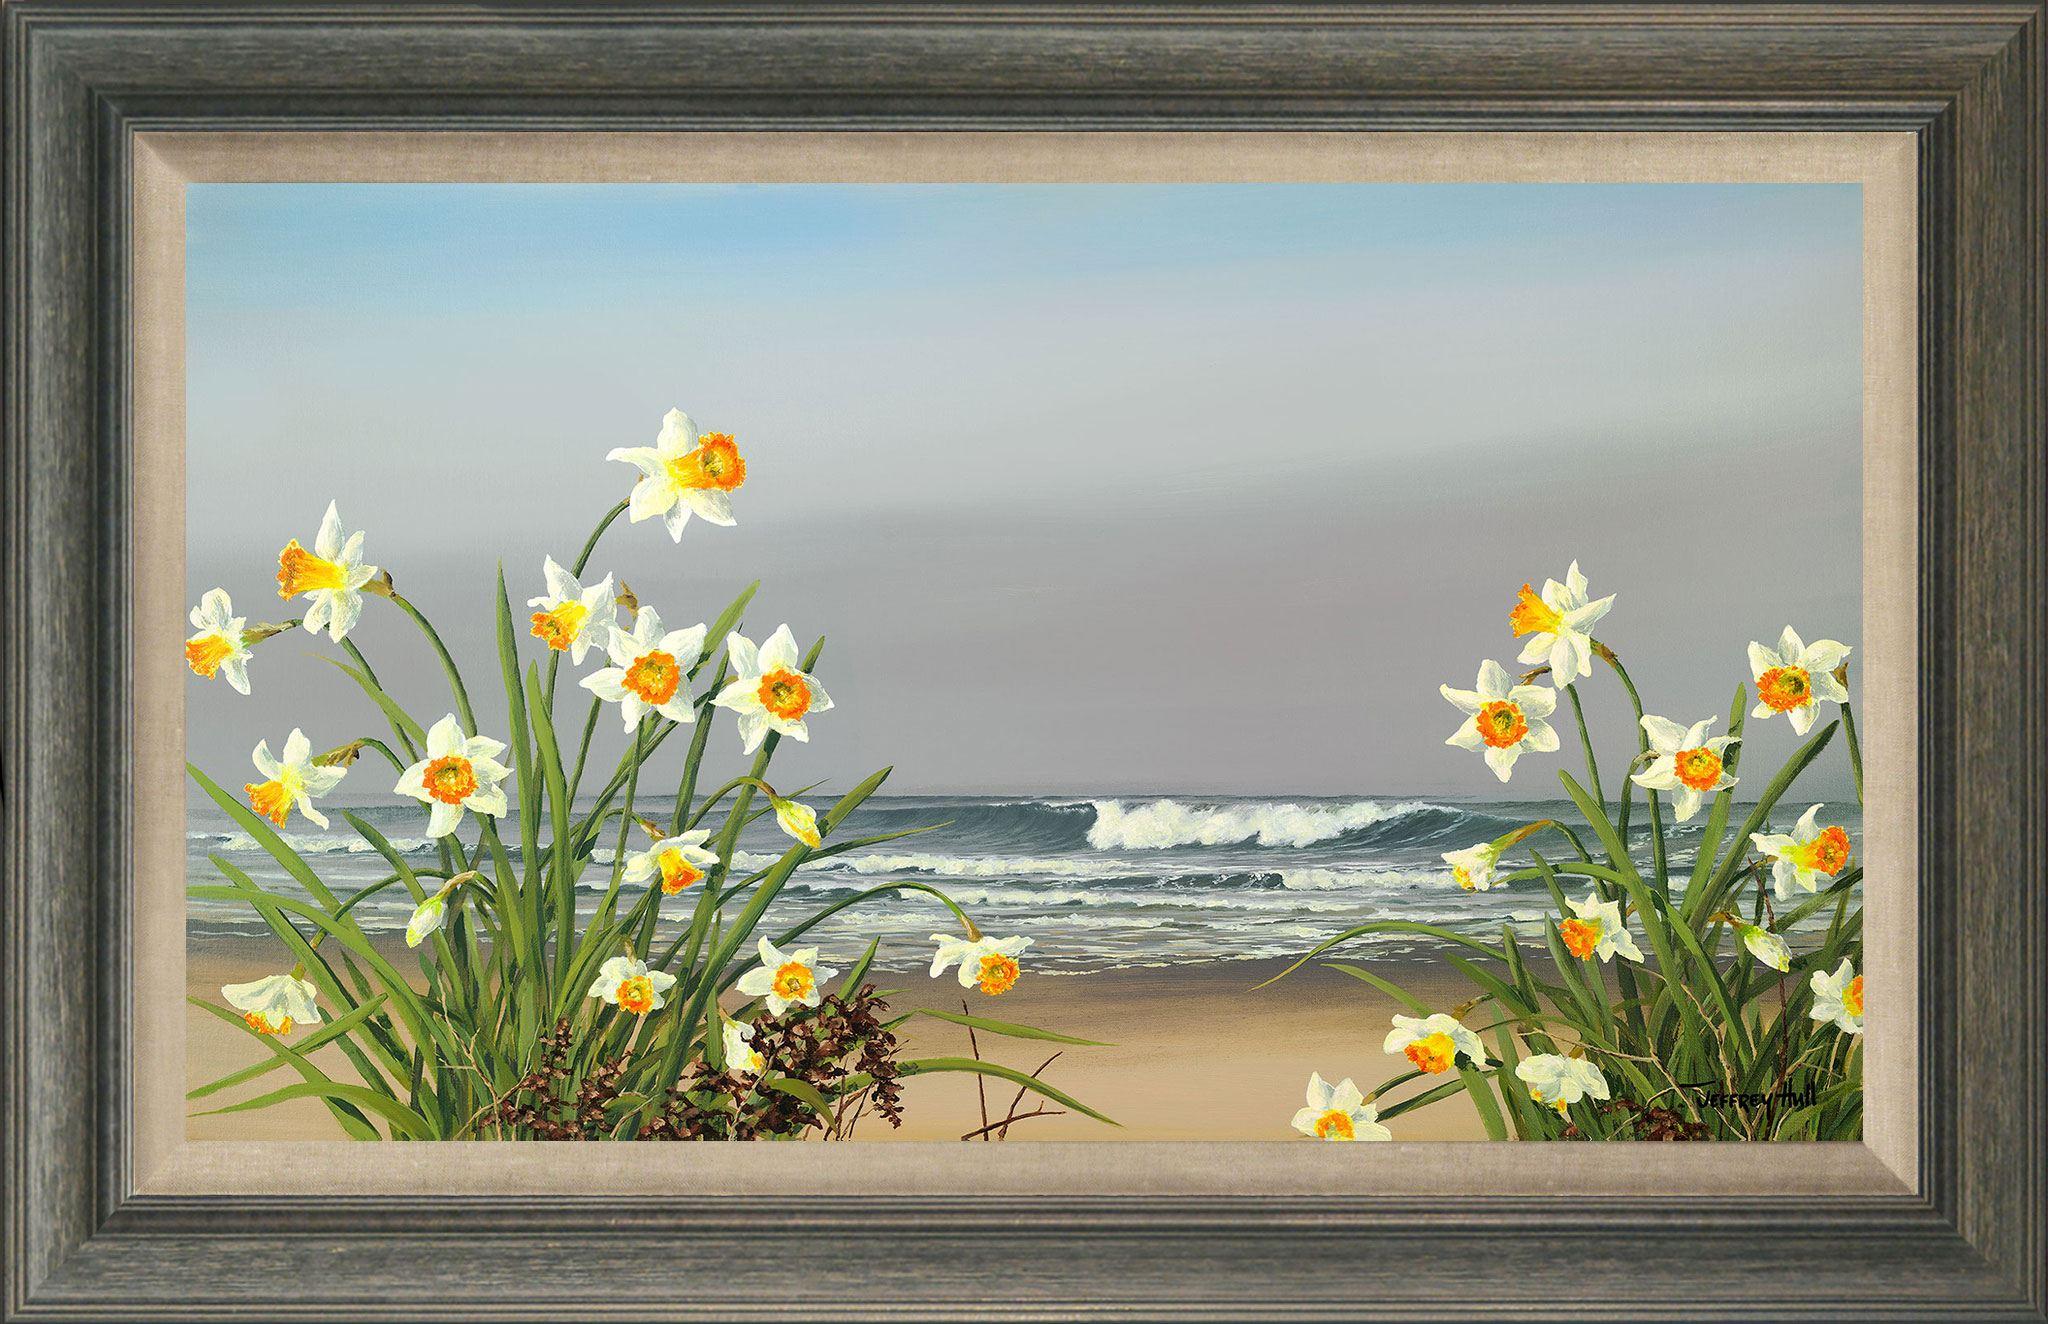 Shoreline-Daffodils-OpenEd-Cascade-Natural-Liner-4-Website-2021